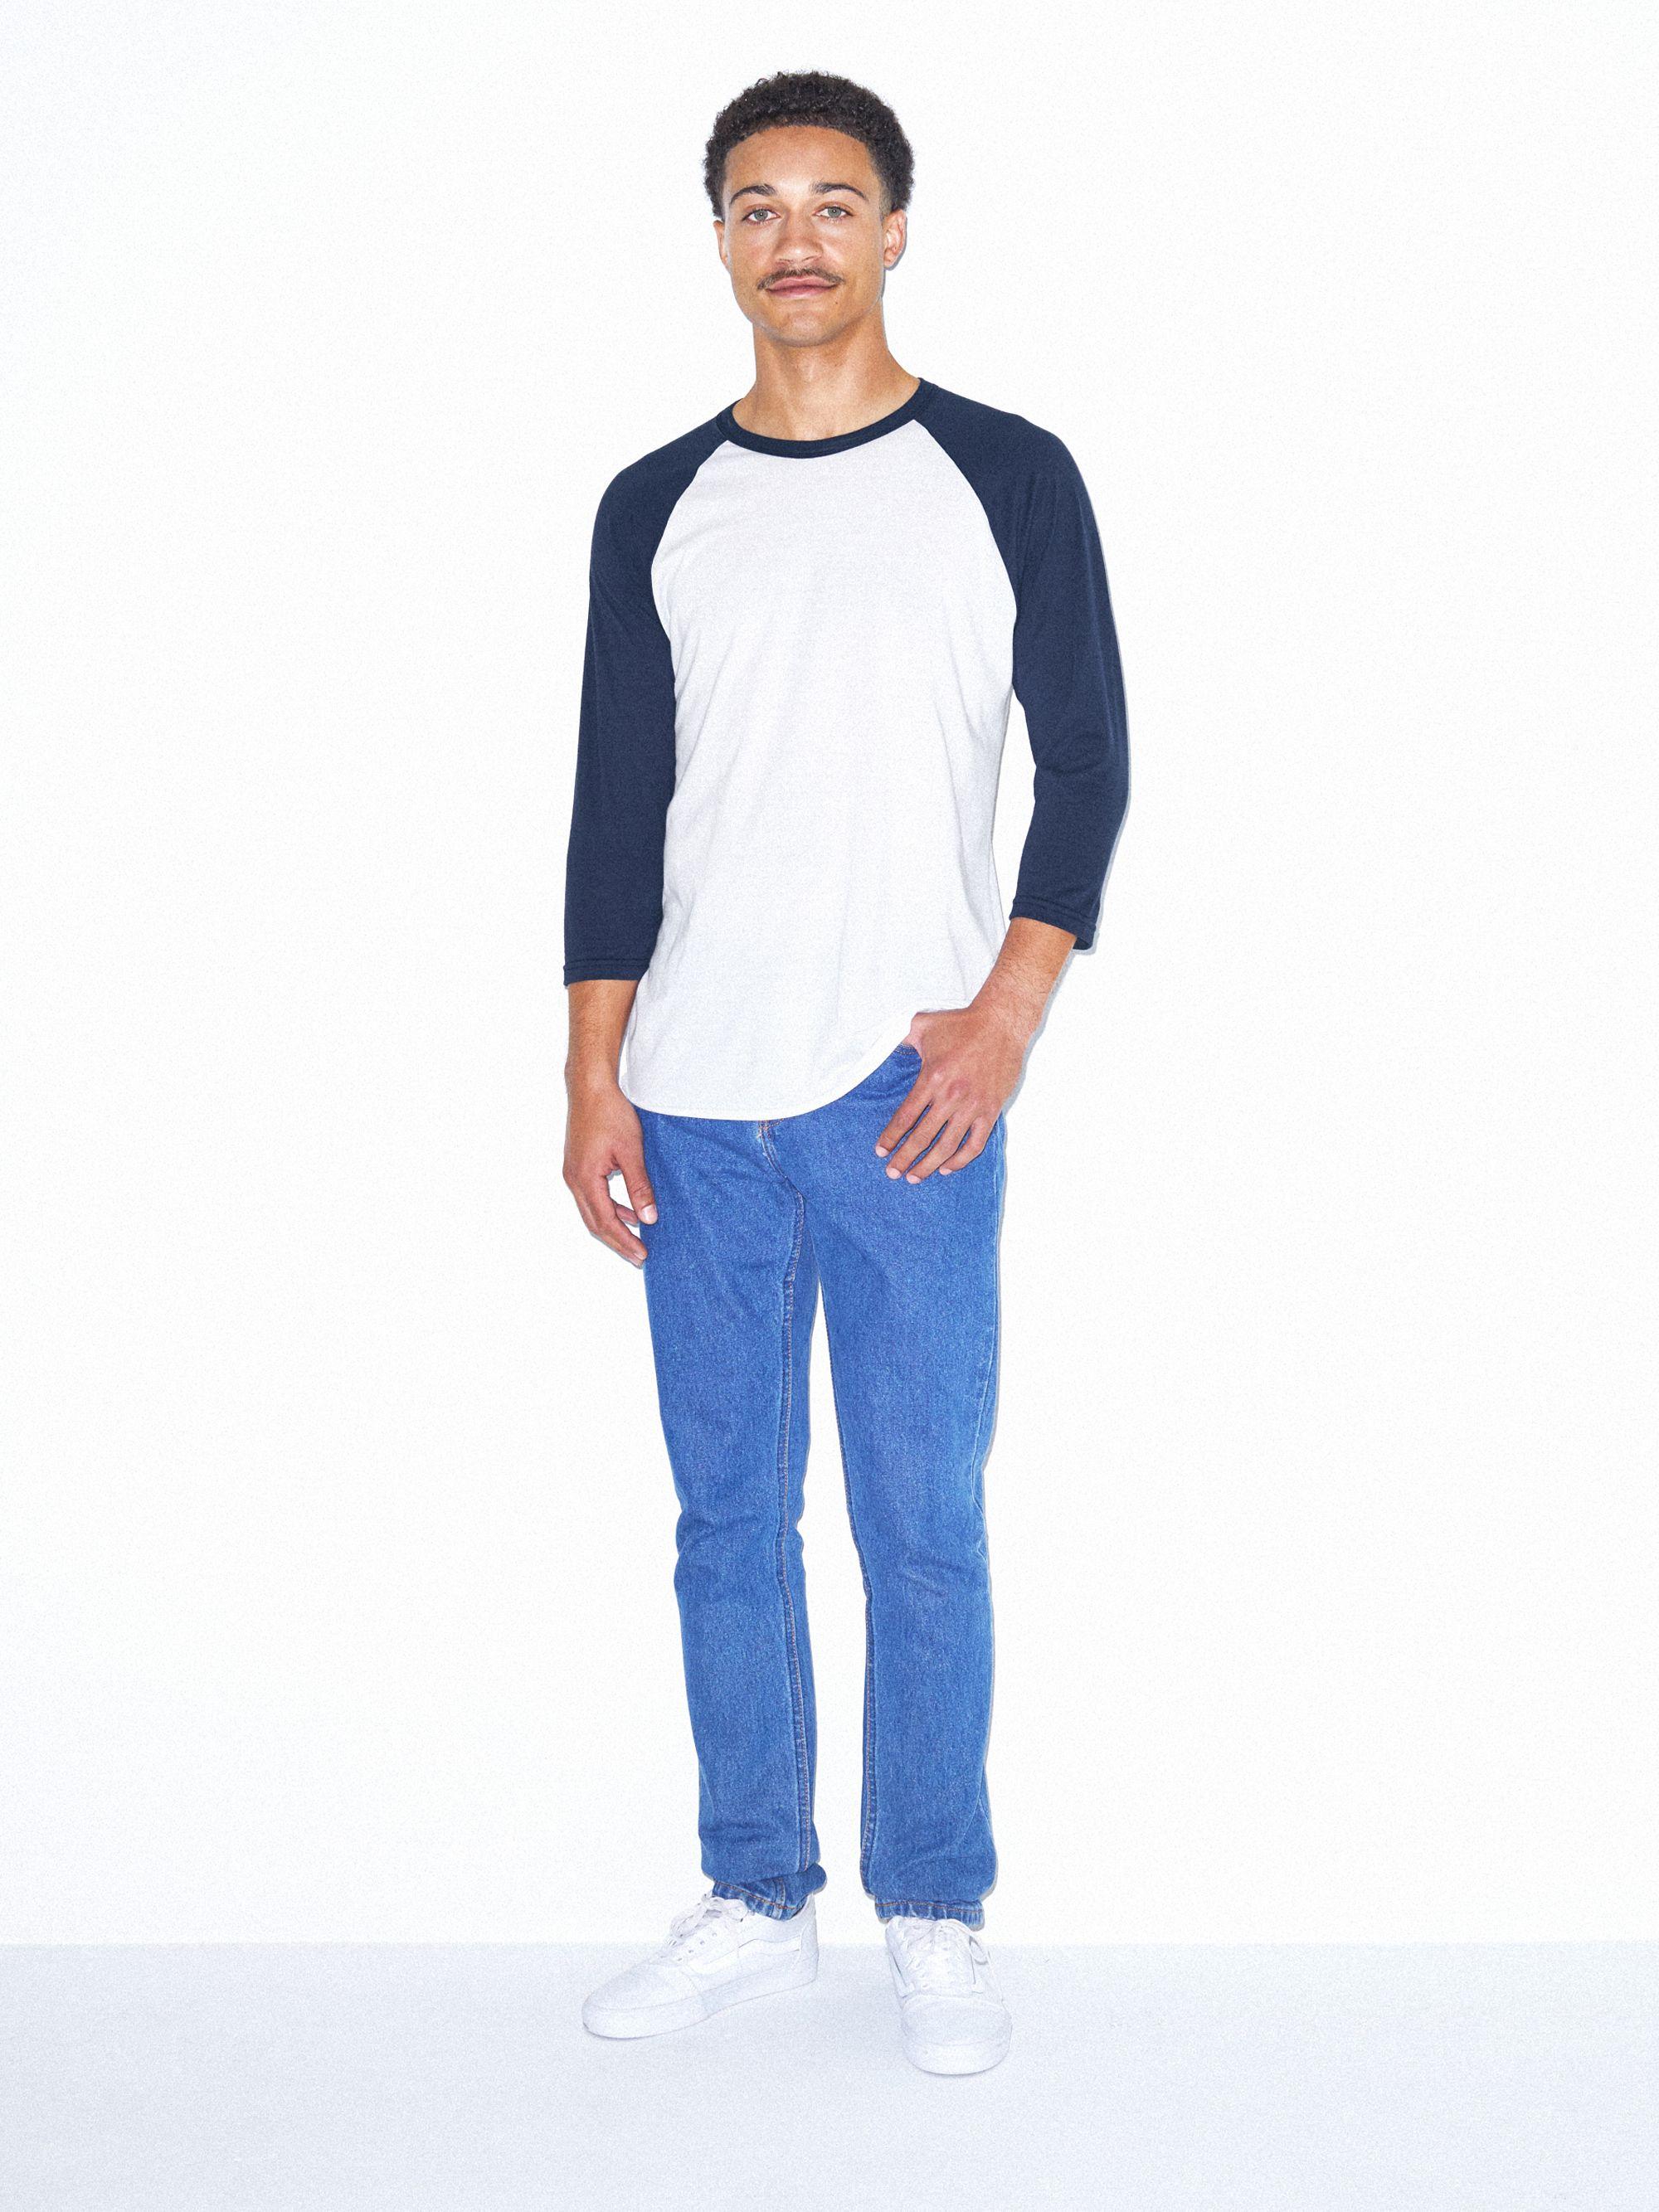 e07a06cbb Unisex 50/50 Raglan 3/4 Sleeve T-Shirt | American Apparel